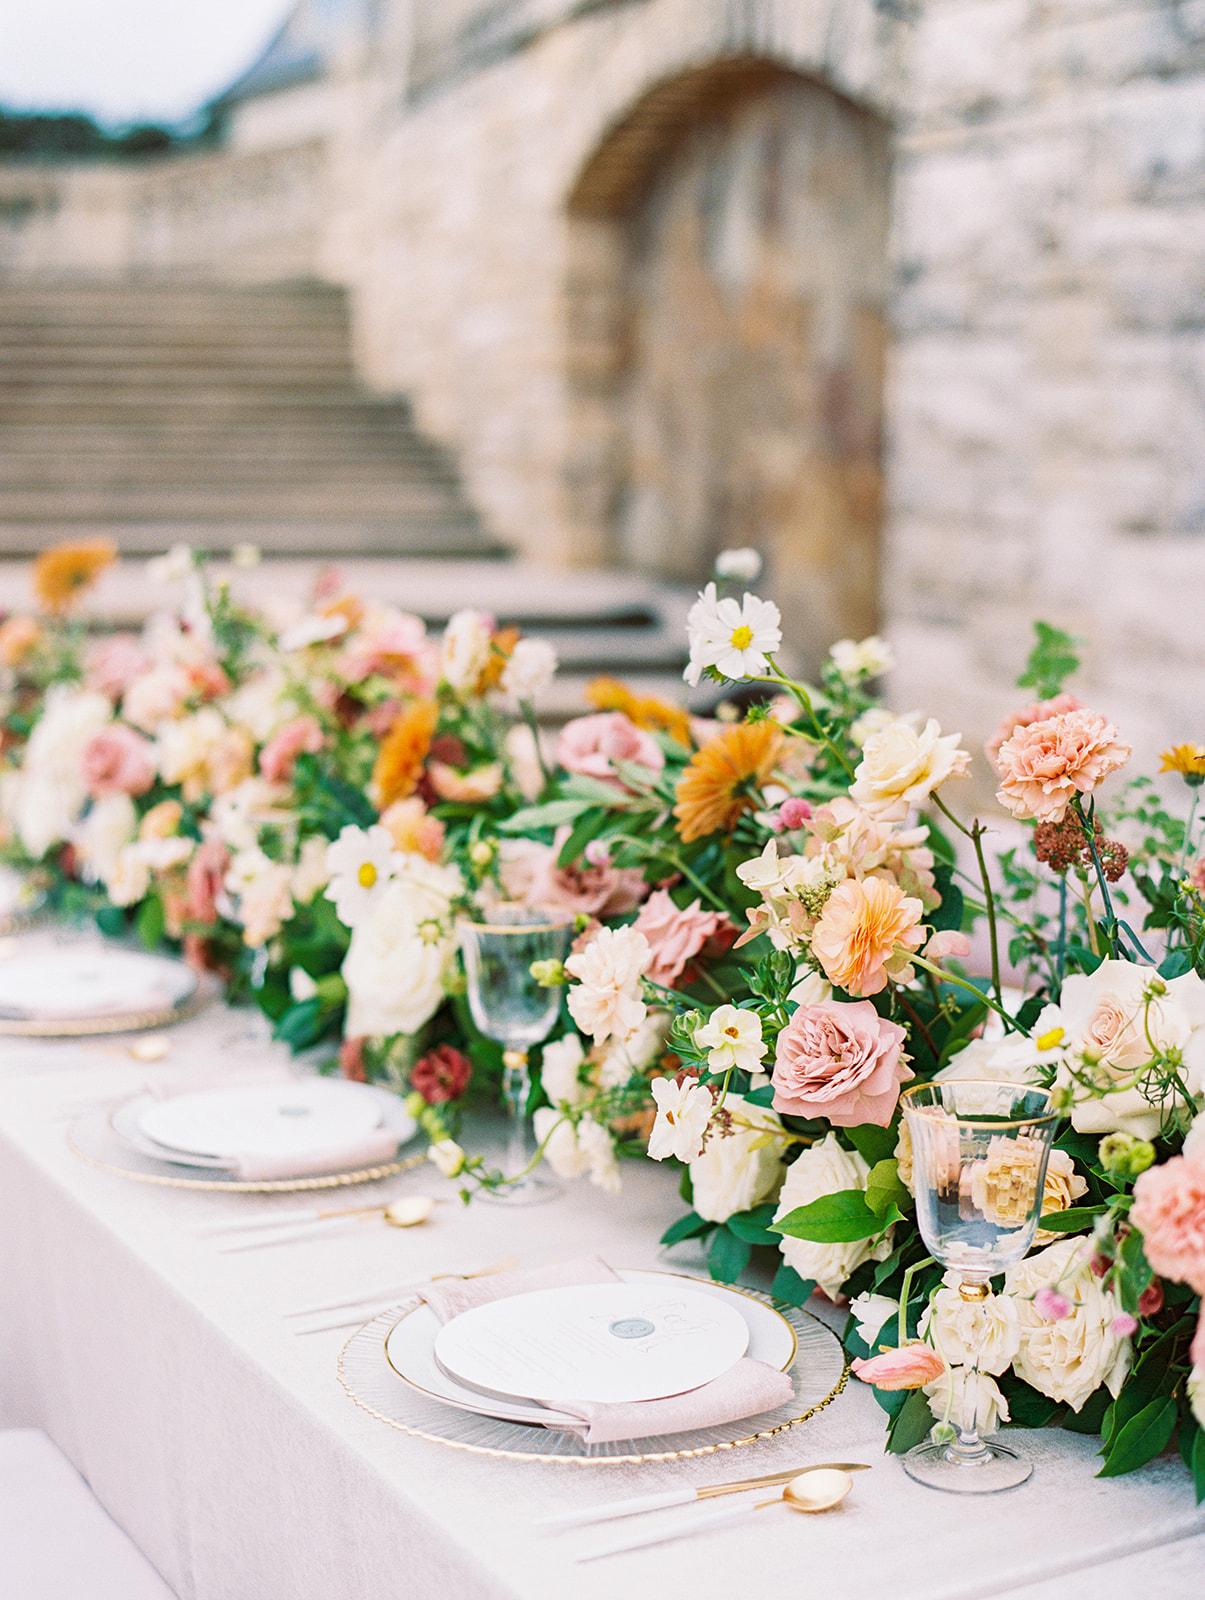 Blushington Blooms colorful wedding centerpieces   Alexa Kay Events